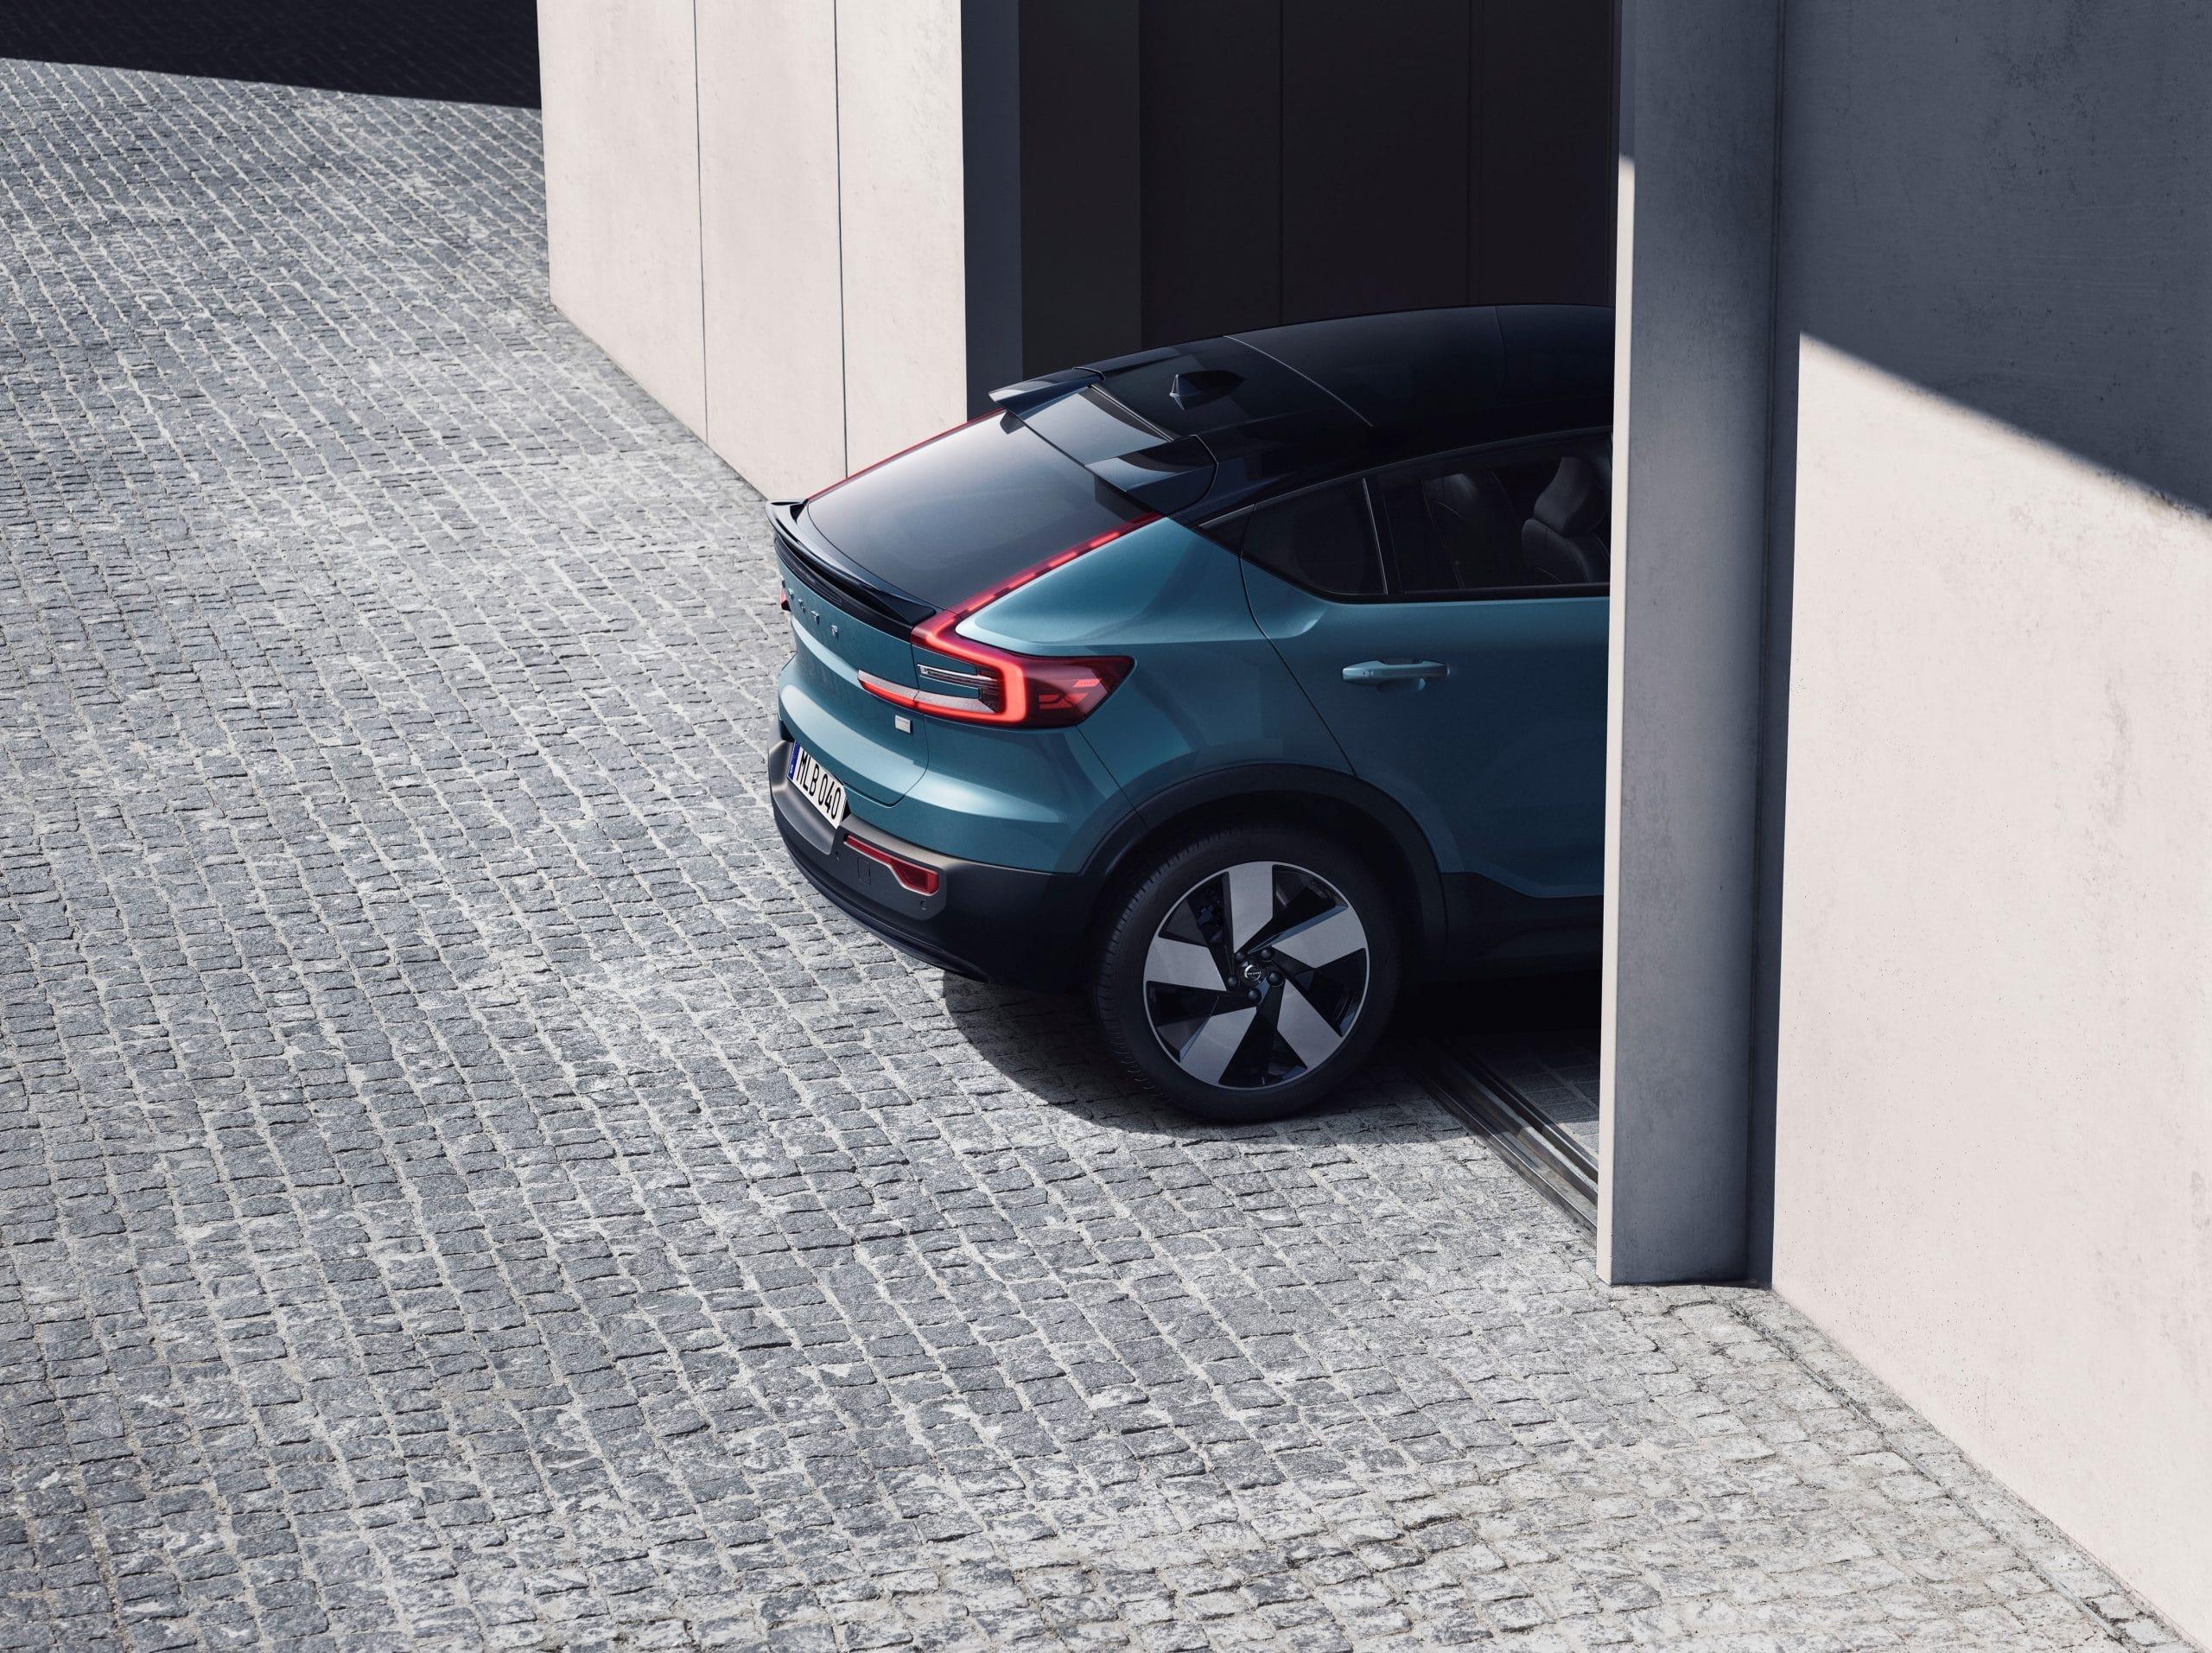 281916 Volvo C40 Recharge scaled Volvo Cars & Geely Holding, δημιουργούν την Aurobay Volvo, Volvo Cars, ειδήσεις, Νέα